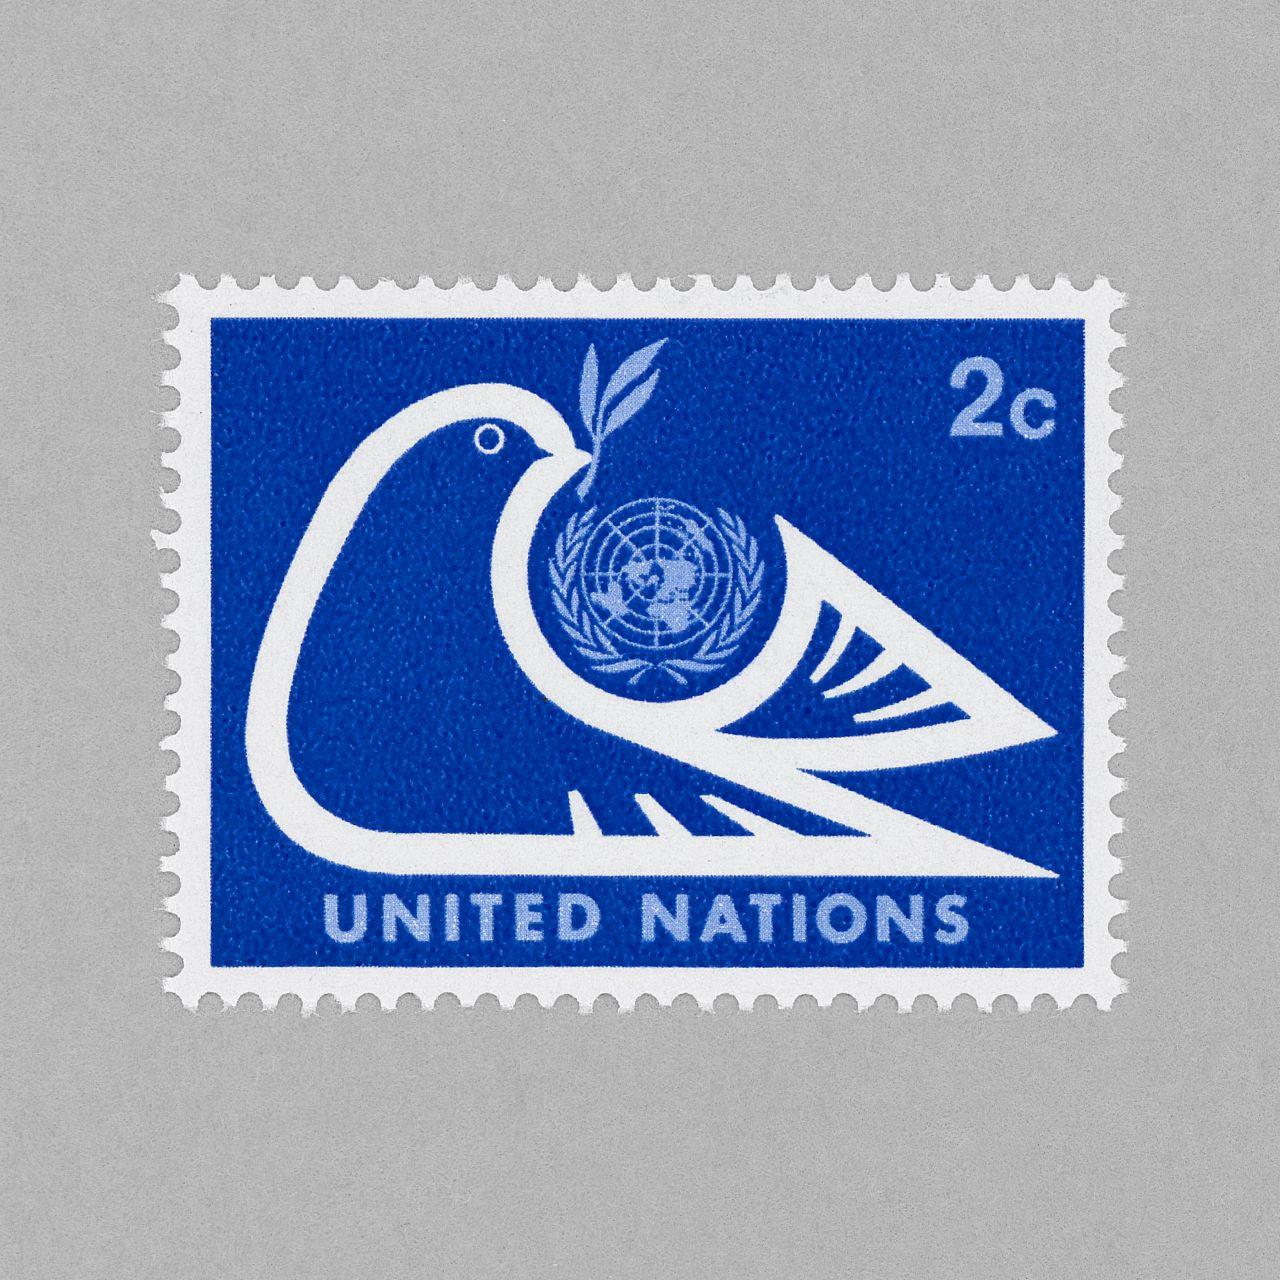 Dove and U.N. Emblem. United Nations (NY), 1974. Design: N. Gur #mnh #mintneverhinged #mnh_un #postagestamps